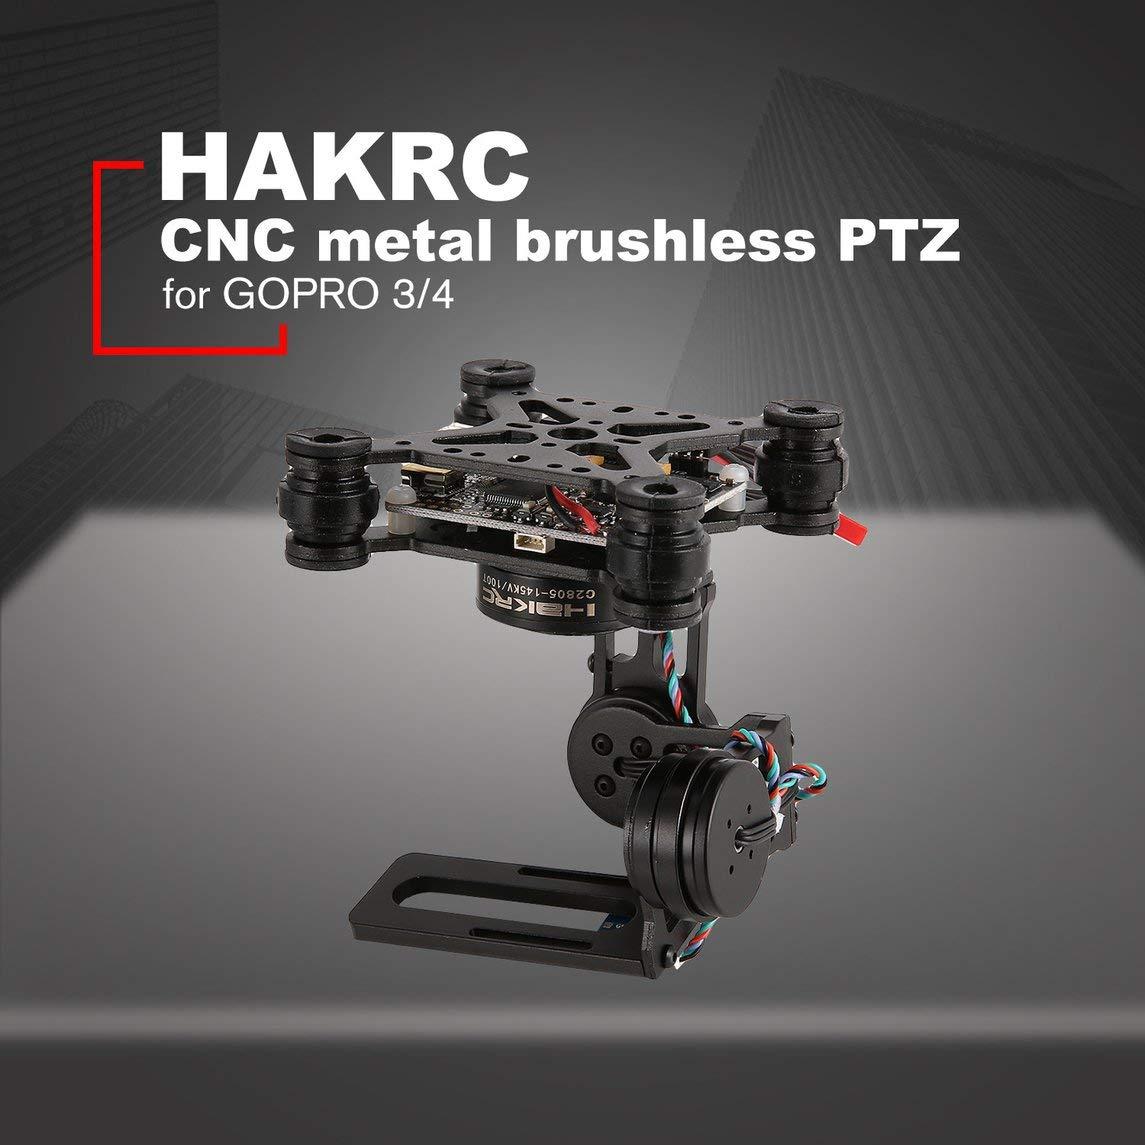 Footprintse HAKRC 3-Achsen Brushless PTZ Control Control Control Panel Gimbal für Drone Gopro3 / 4 DJI Phantom-Farbe: Schwarz c71ff4